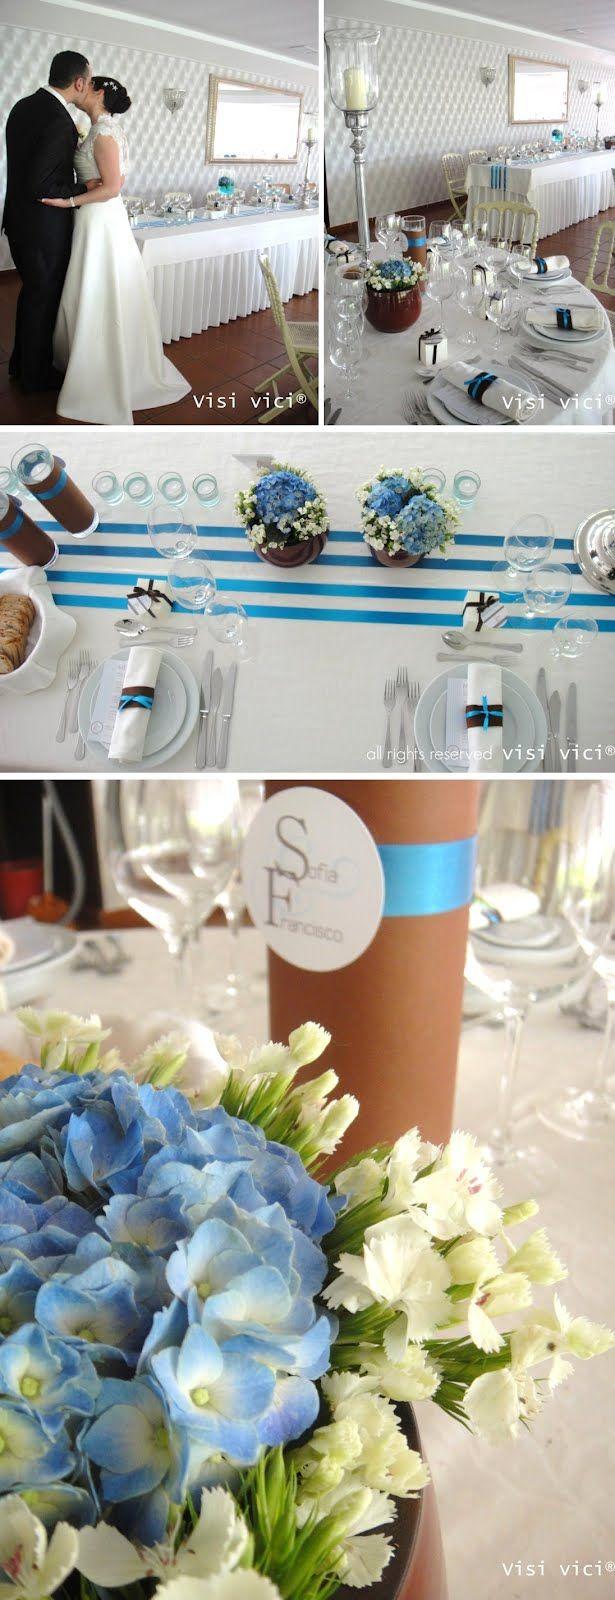 Our Lovely Pink World: PINK & BLUE  Blue Wedding Decoration by VISI VICI  https://www.facebook.com/VISIVICIprodutoresdesonhos